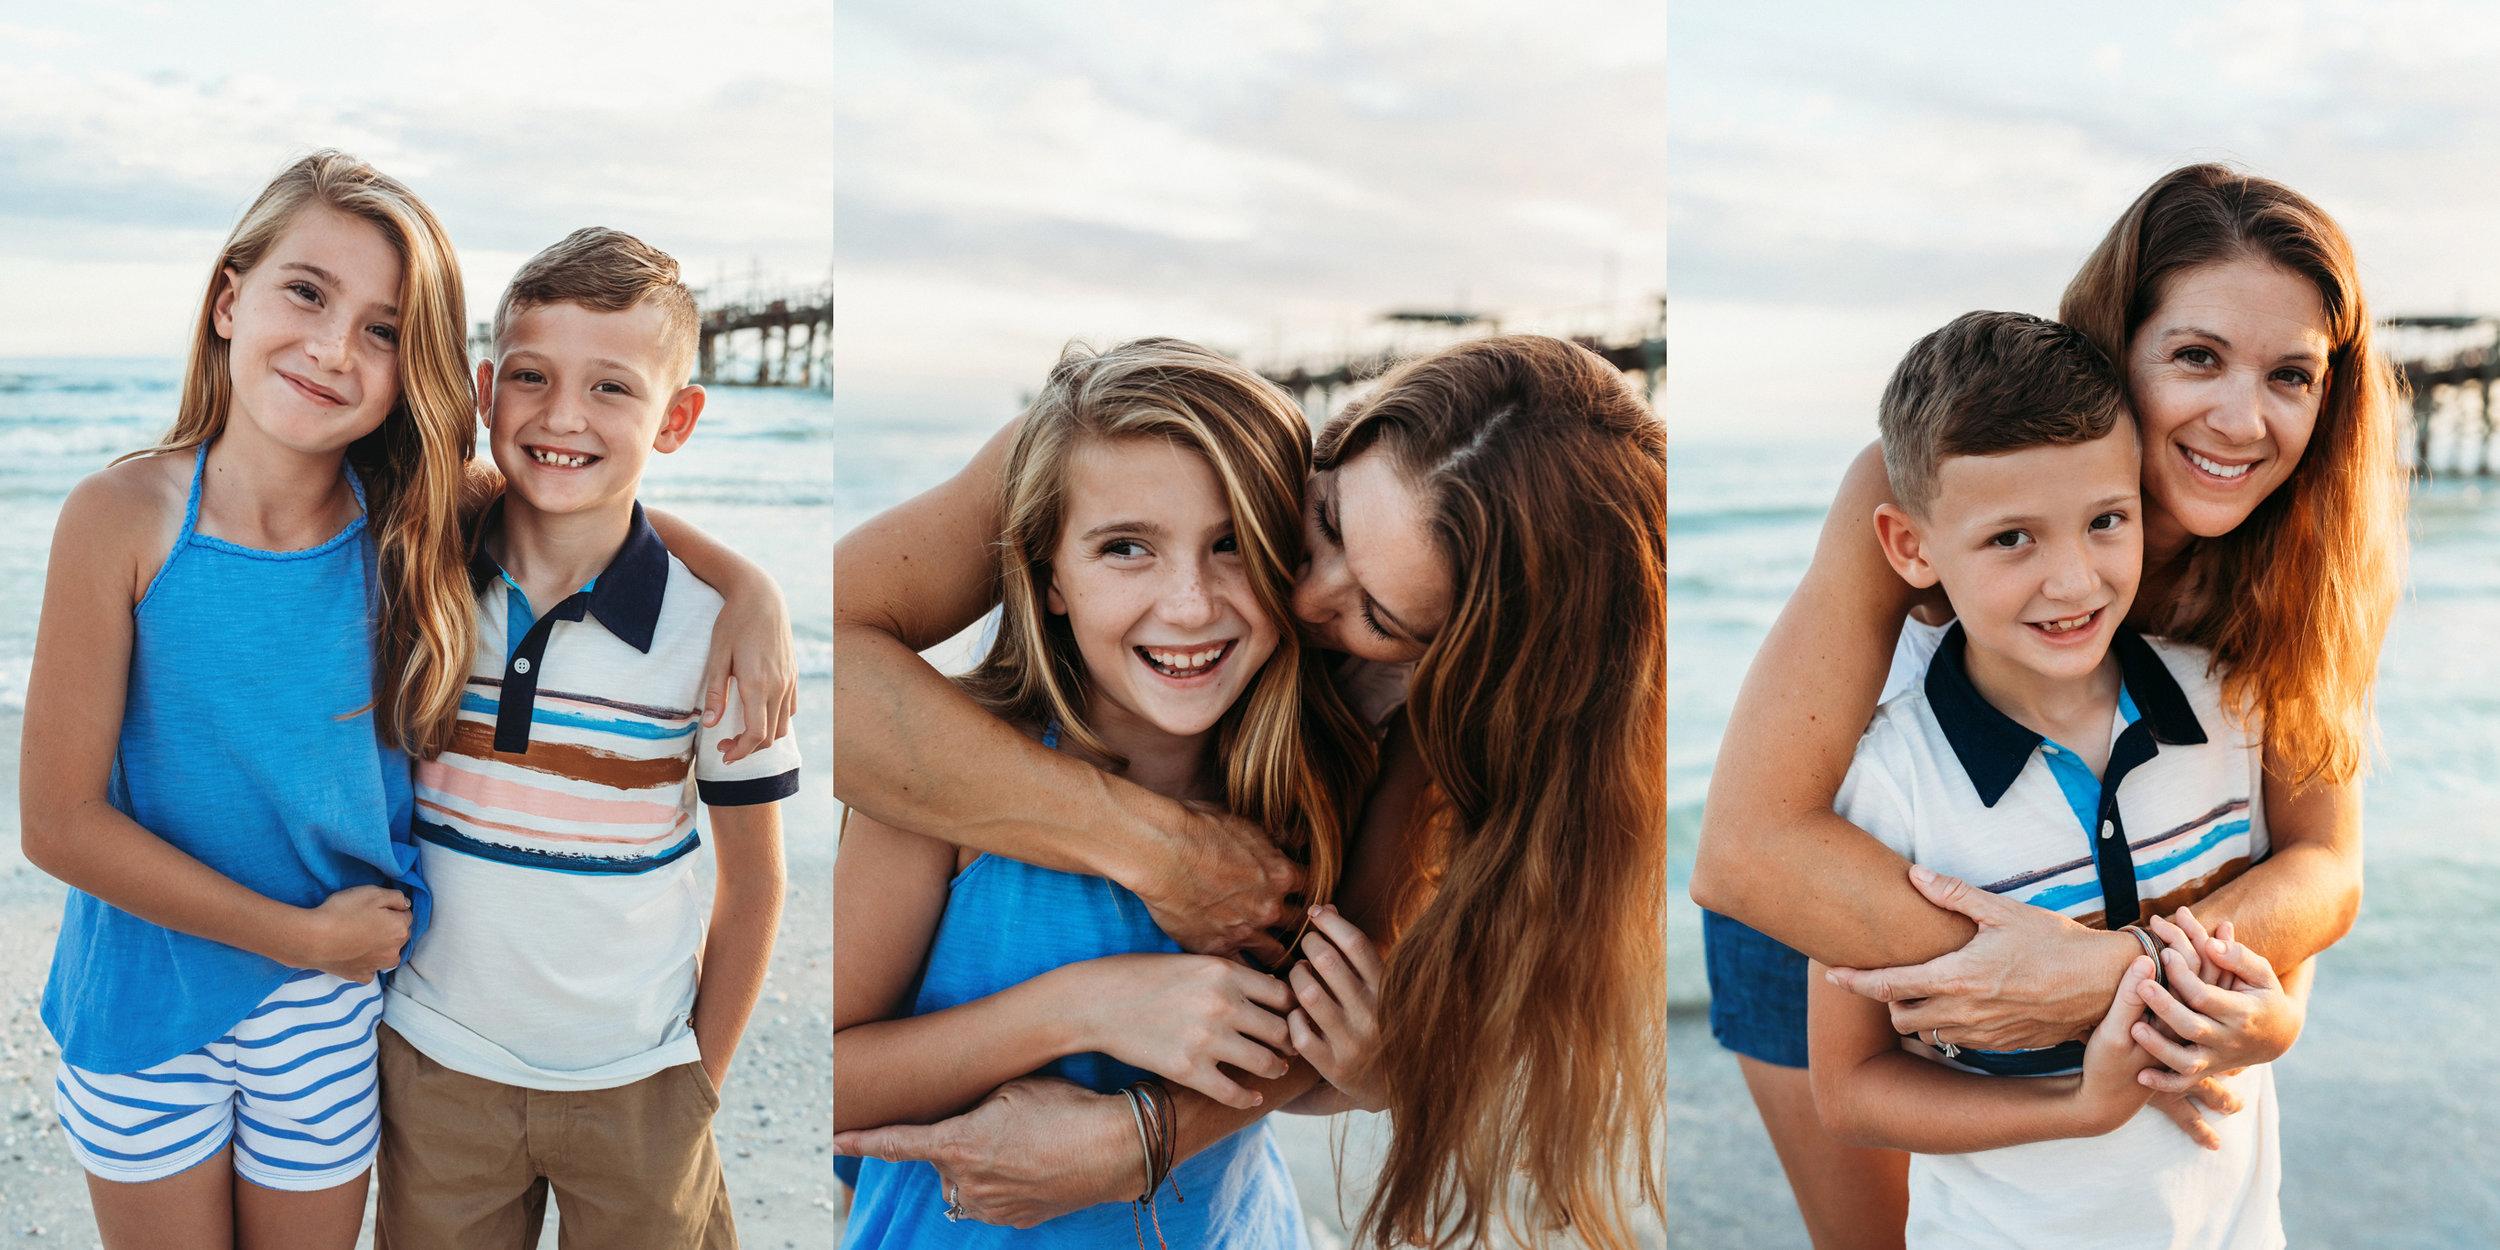 Tampa Family Photographer_Jennifer Kielich Photography_Niki Harris for blog triptych.jpg